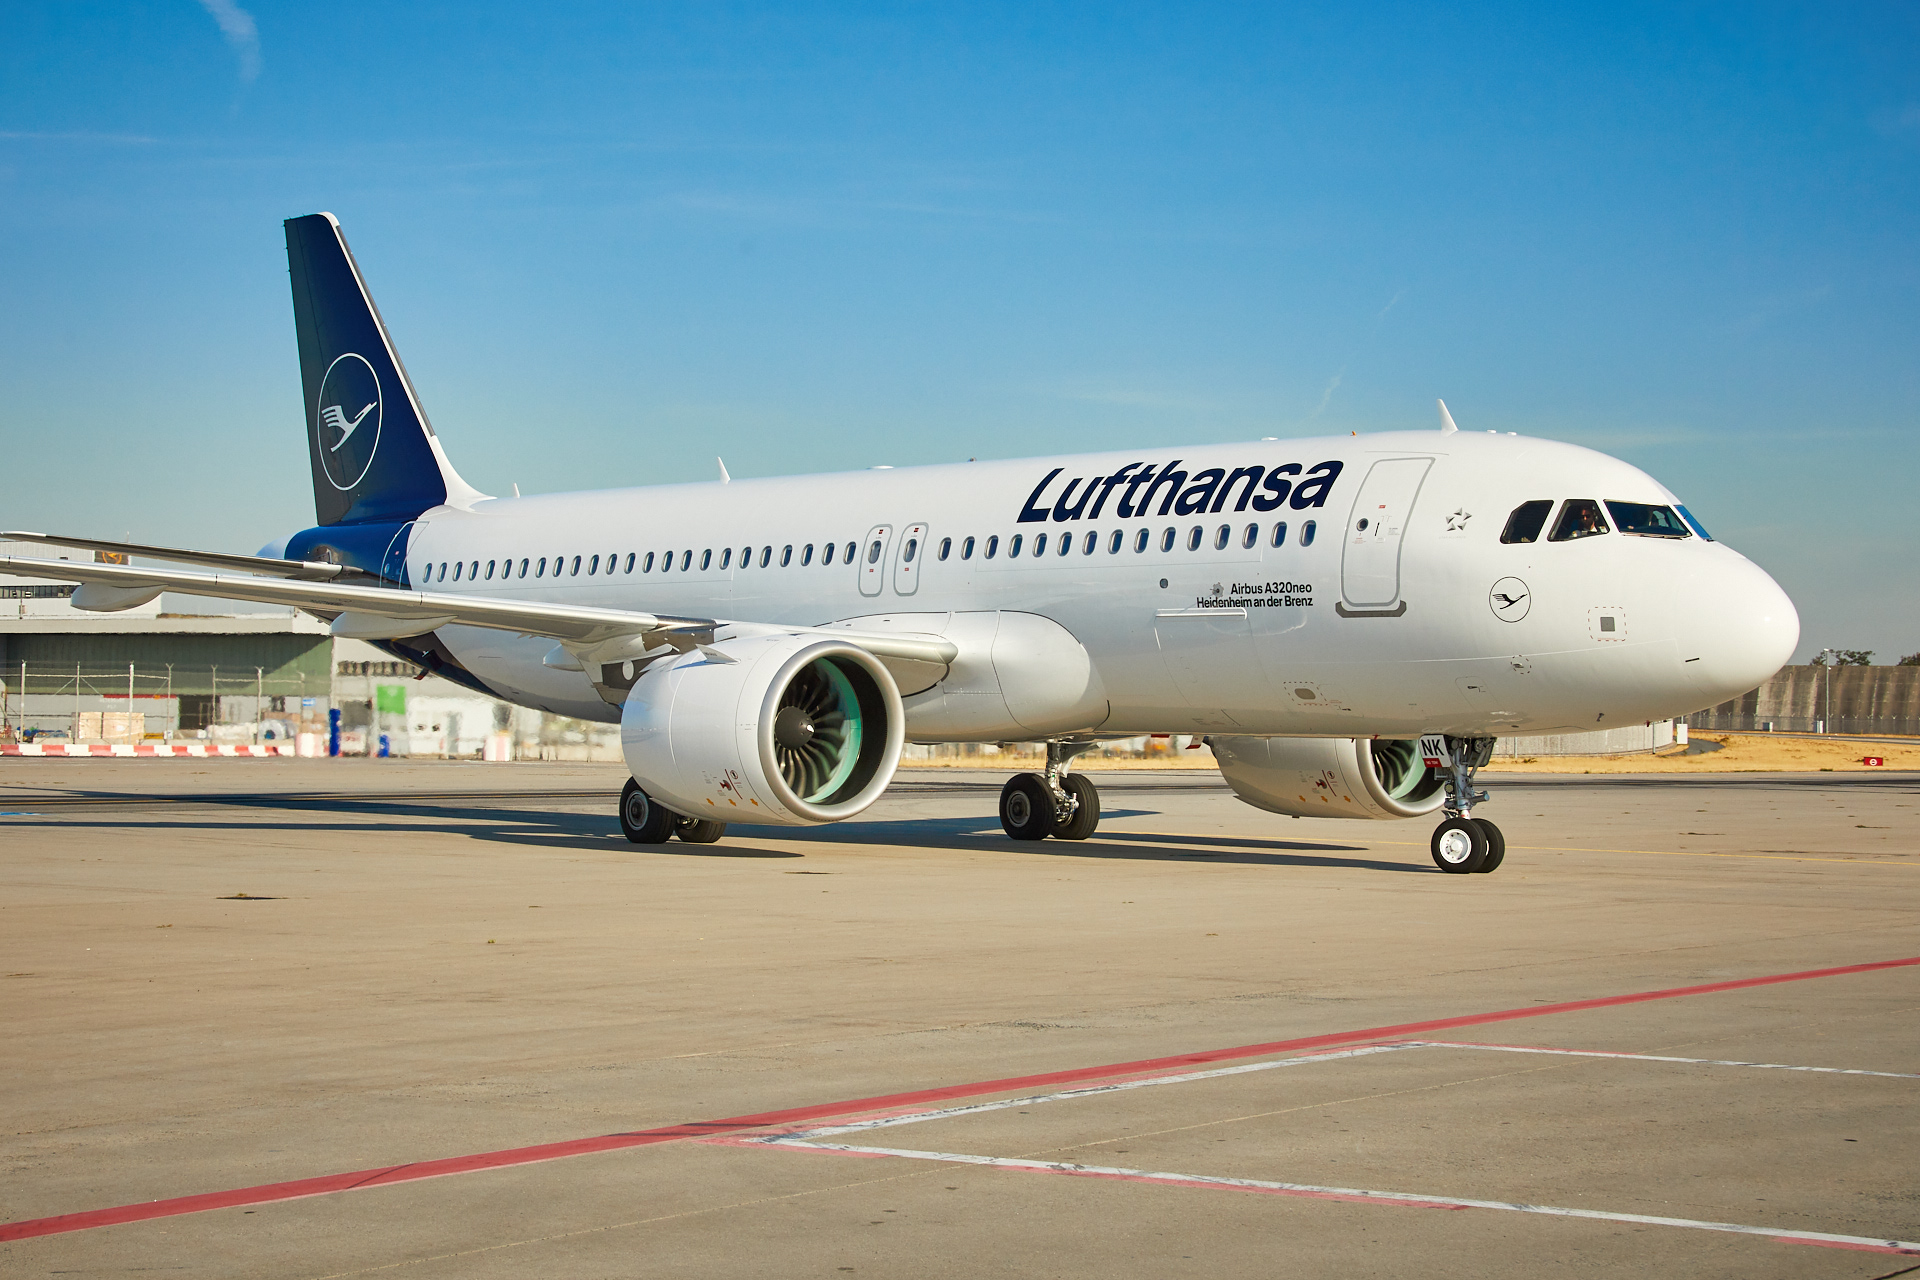 En Airbus A320neo fra det tyske flyselskab Lufthansa. Foto: Lufthansa